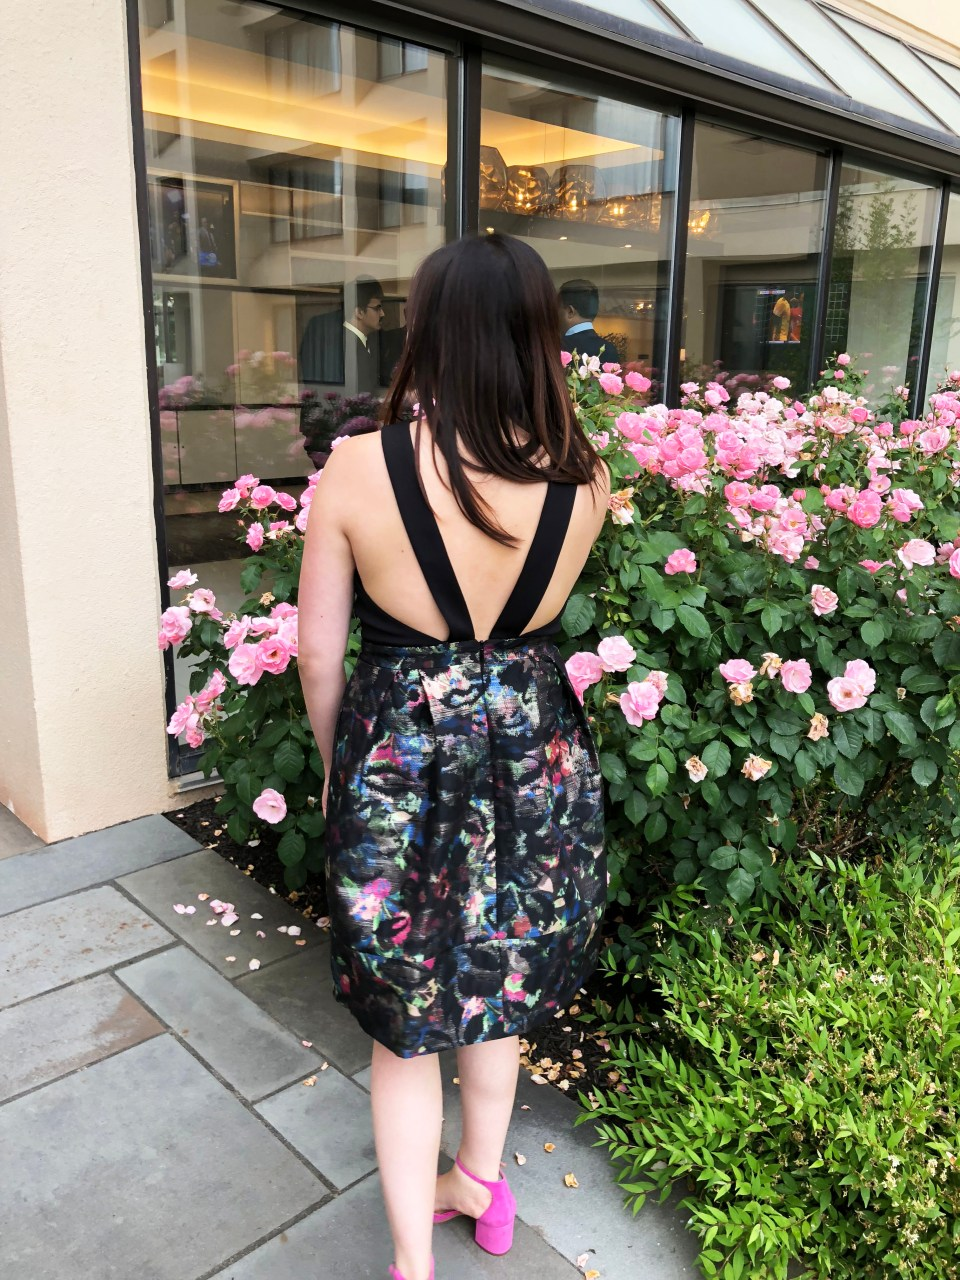 Multicolor Skirt Keyhole Dress 2